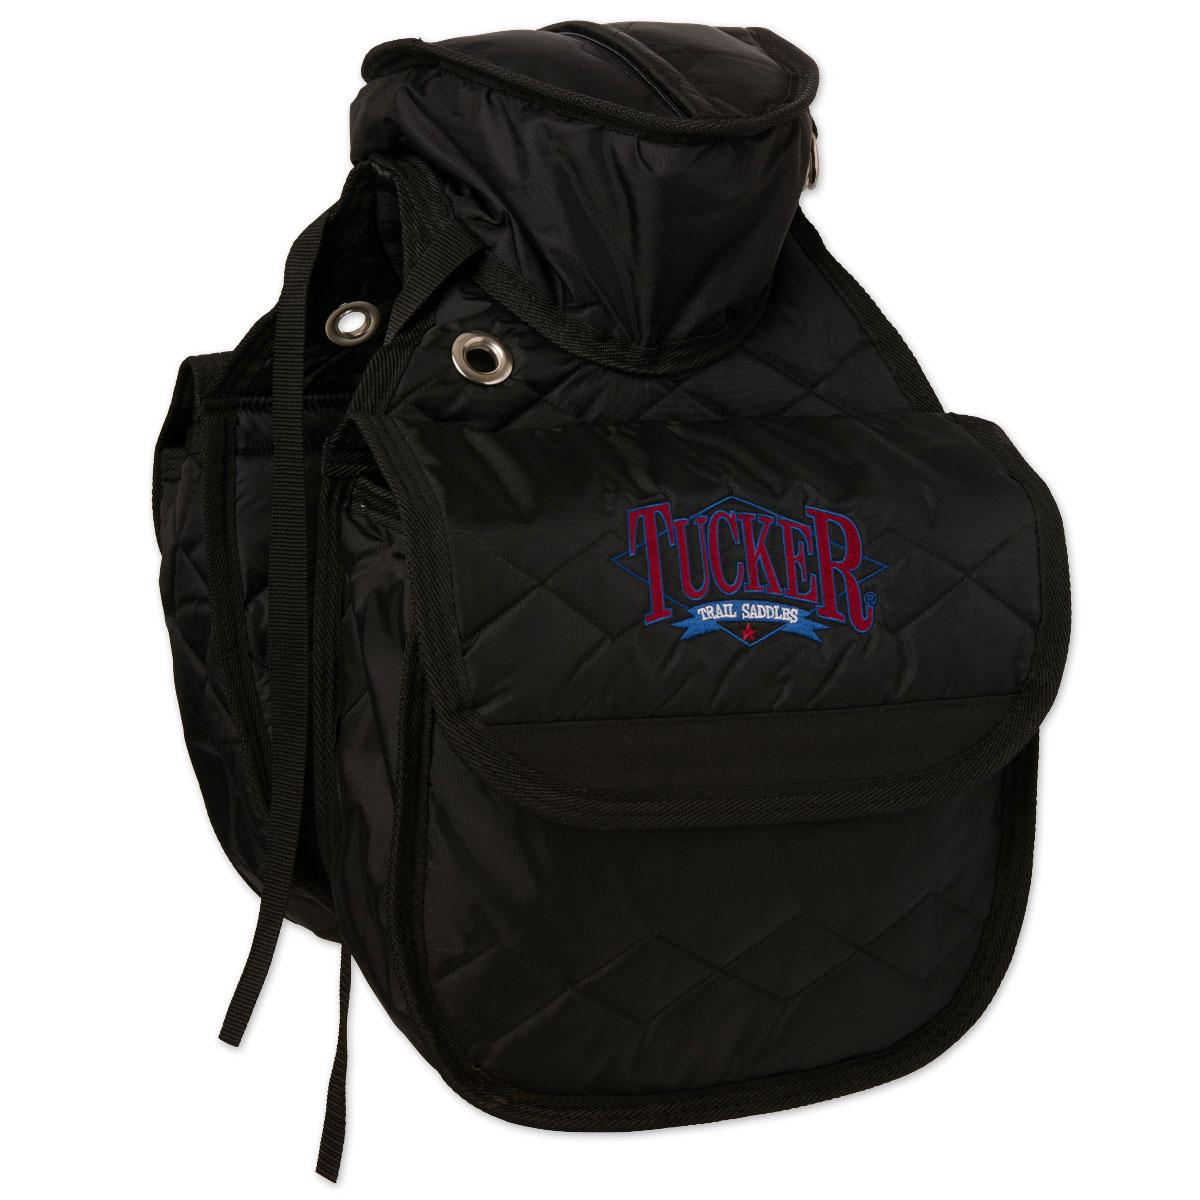 Tucker Trail Saddle Cantle Bag